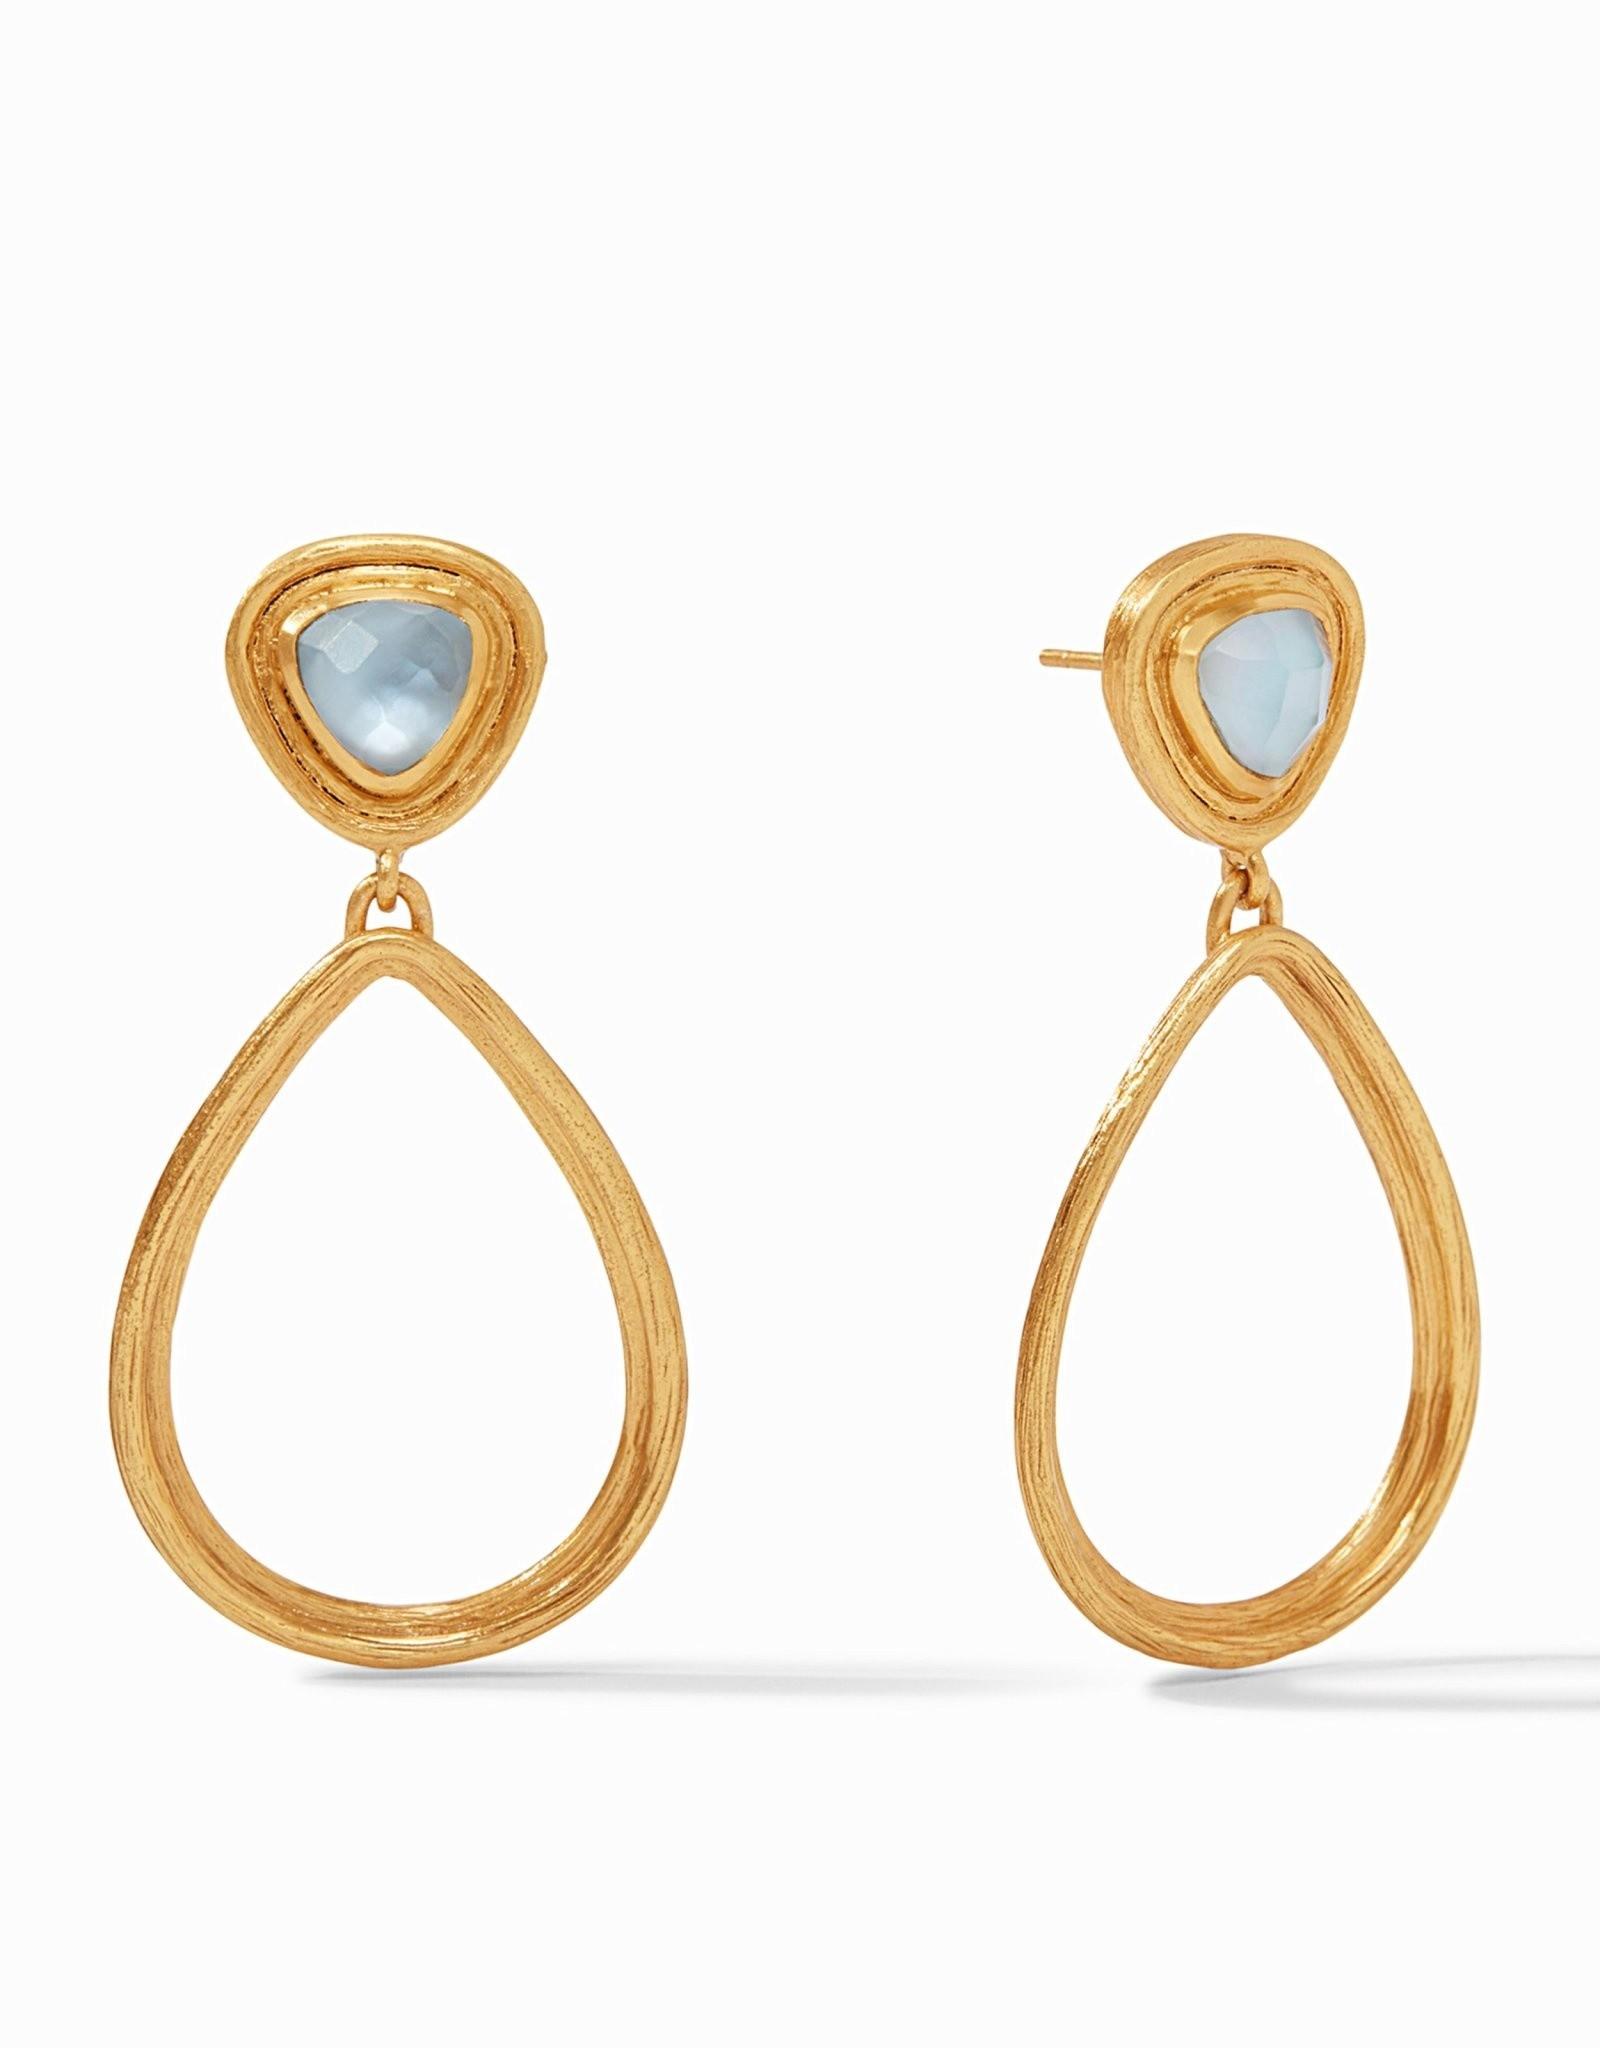 Julie Vos Barcelona Statement Earring Gold Iridescent Chalcedony Blue